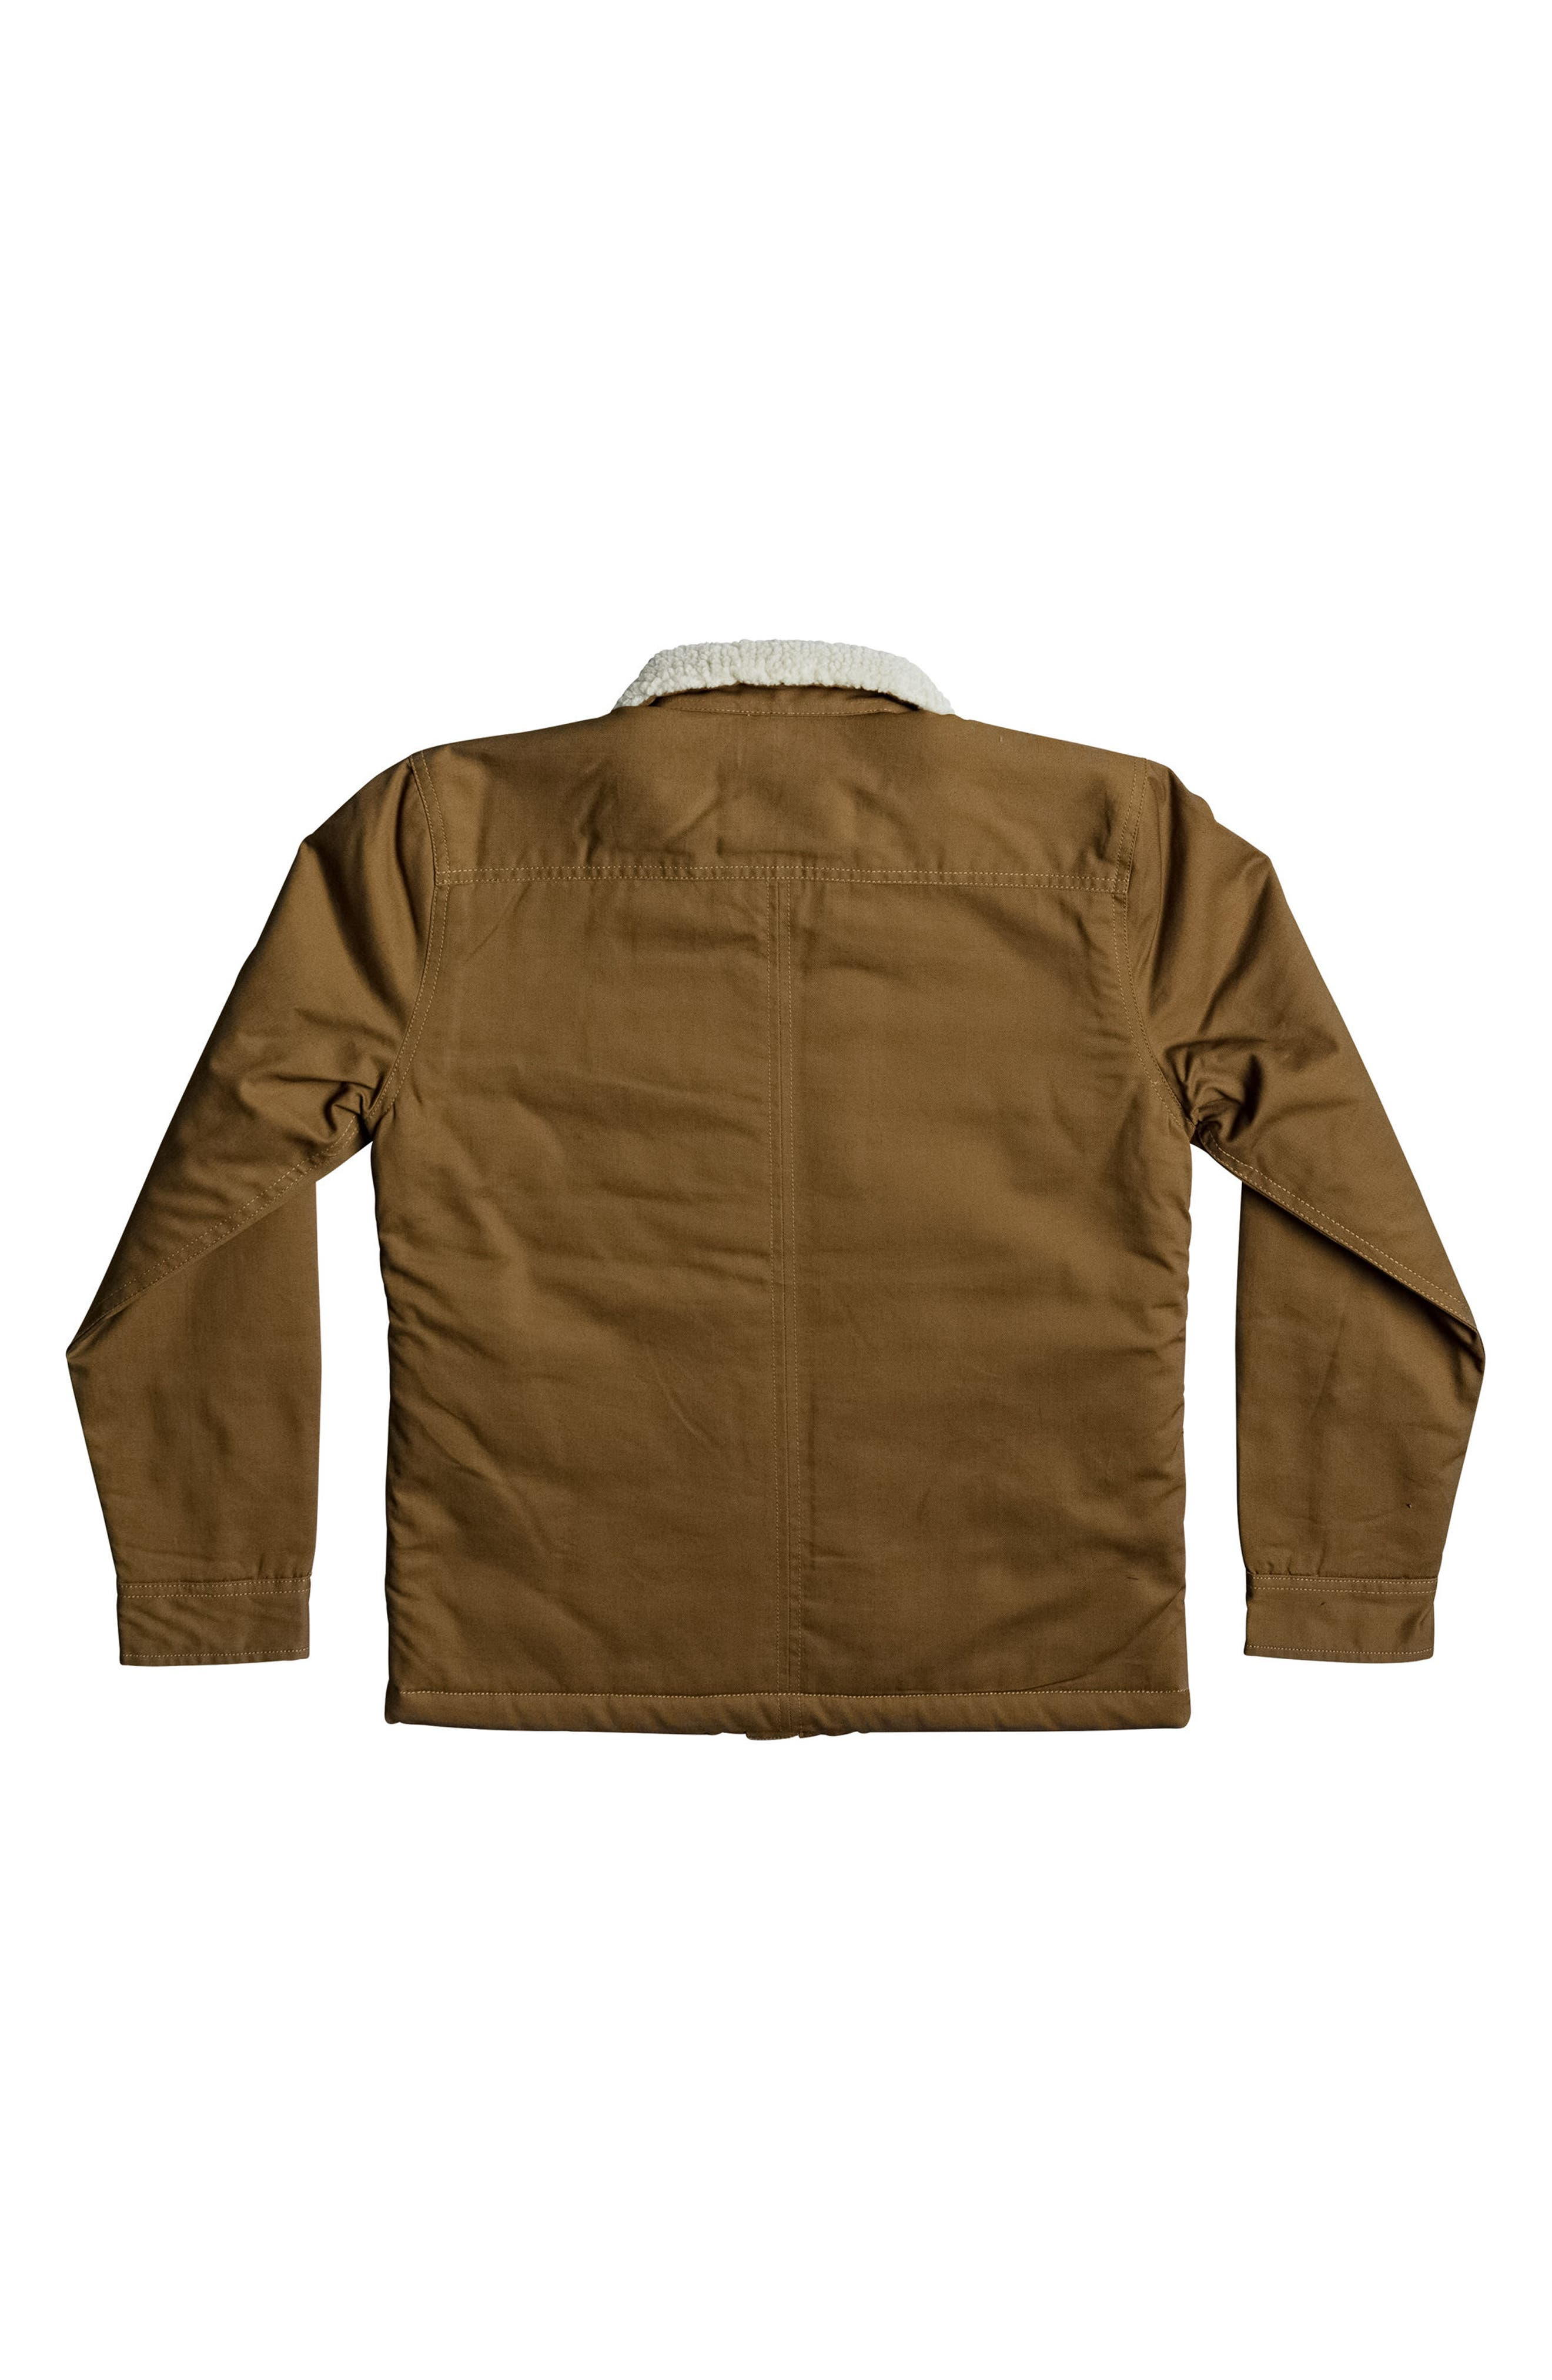 Dabein Fleece Lined Jacket,                             Alternate thumbnail 2, color,